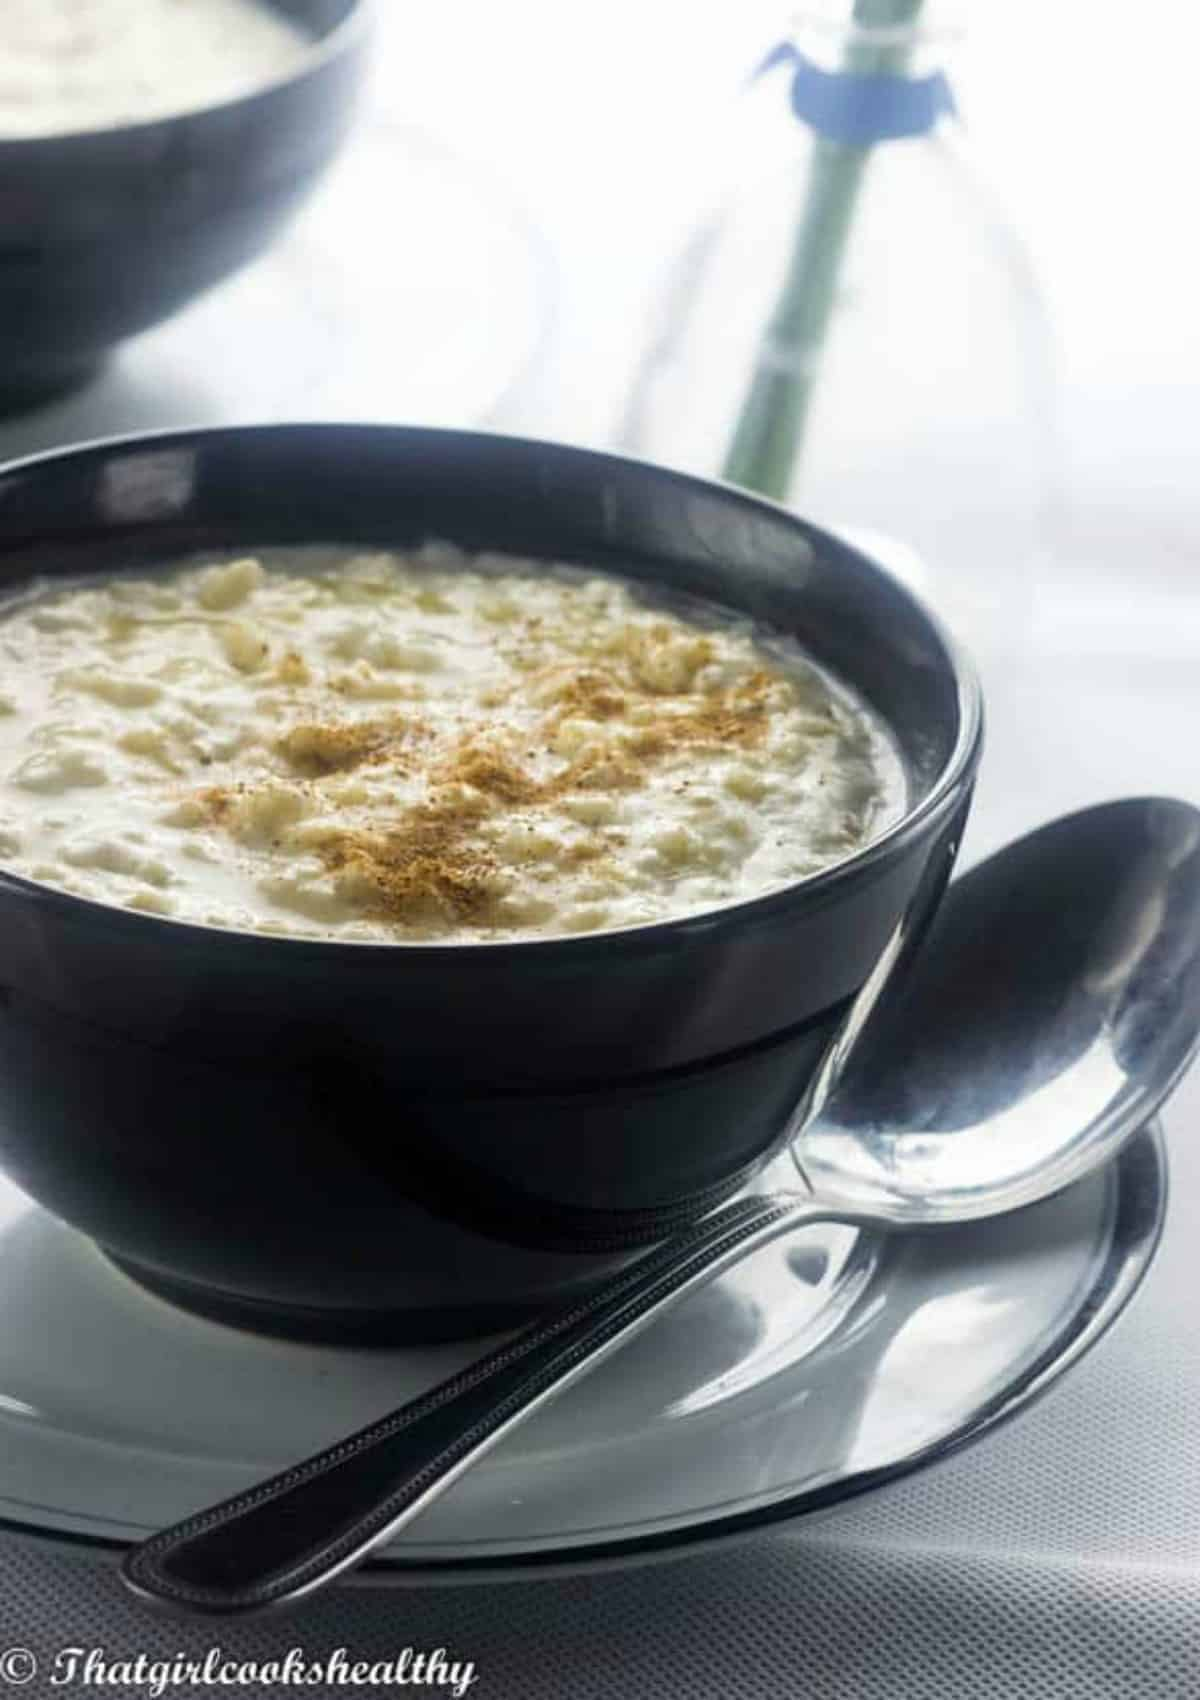 porridge in a black bowl on a plate